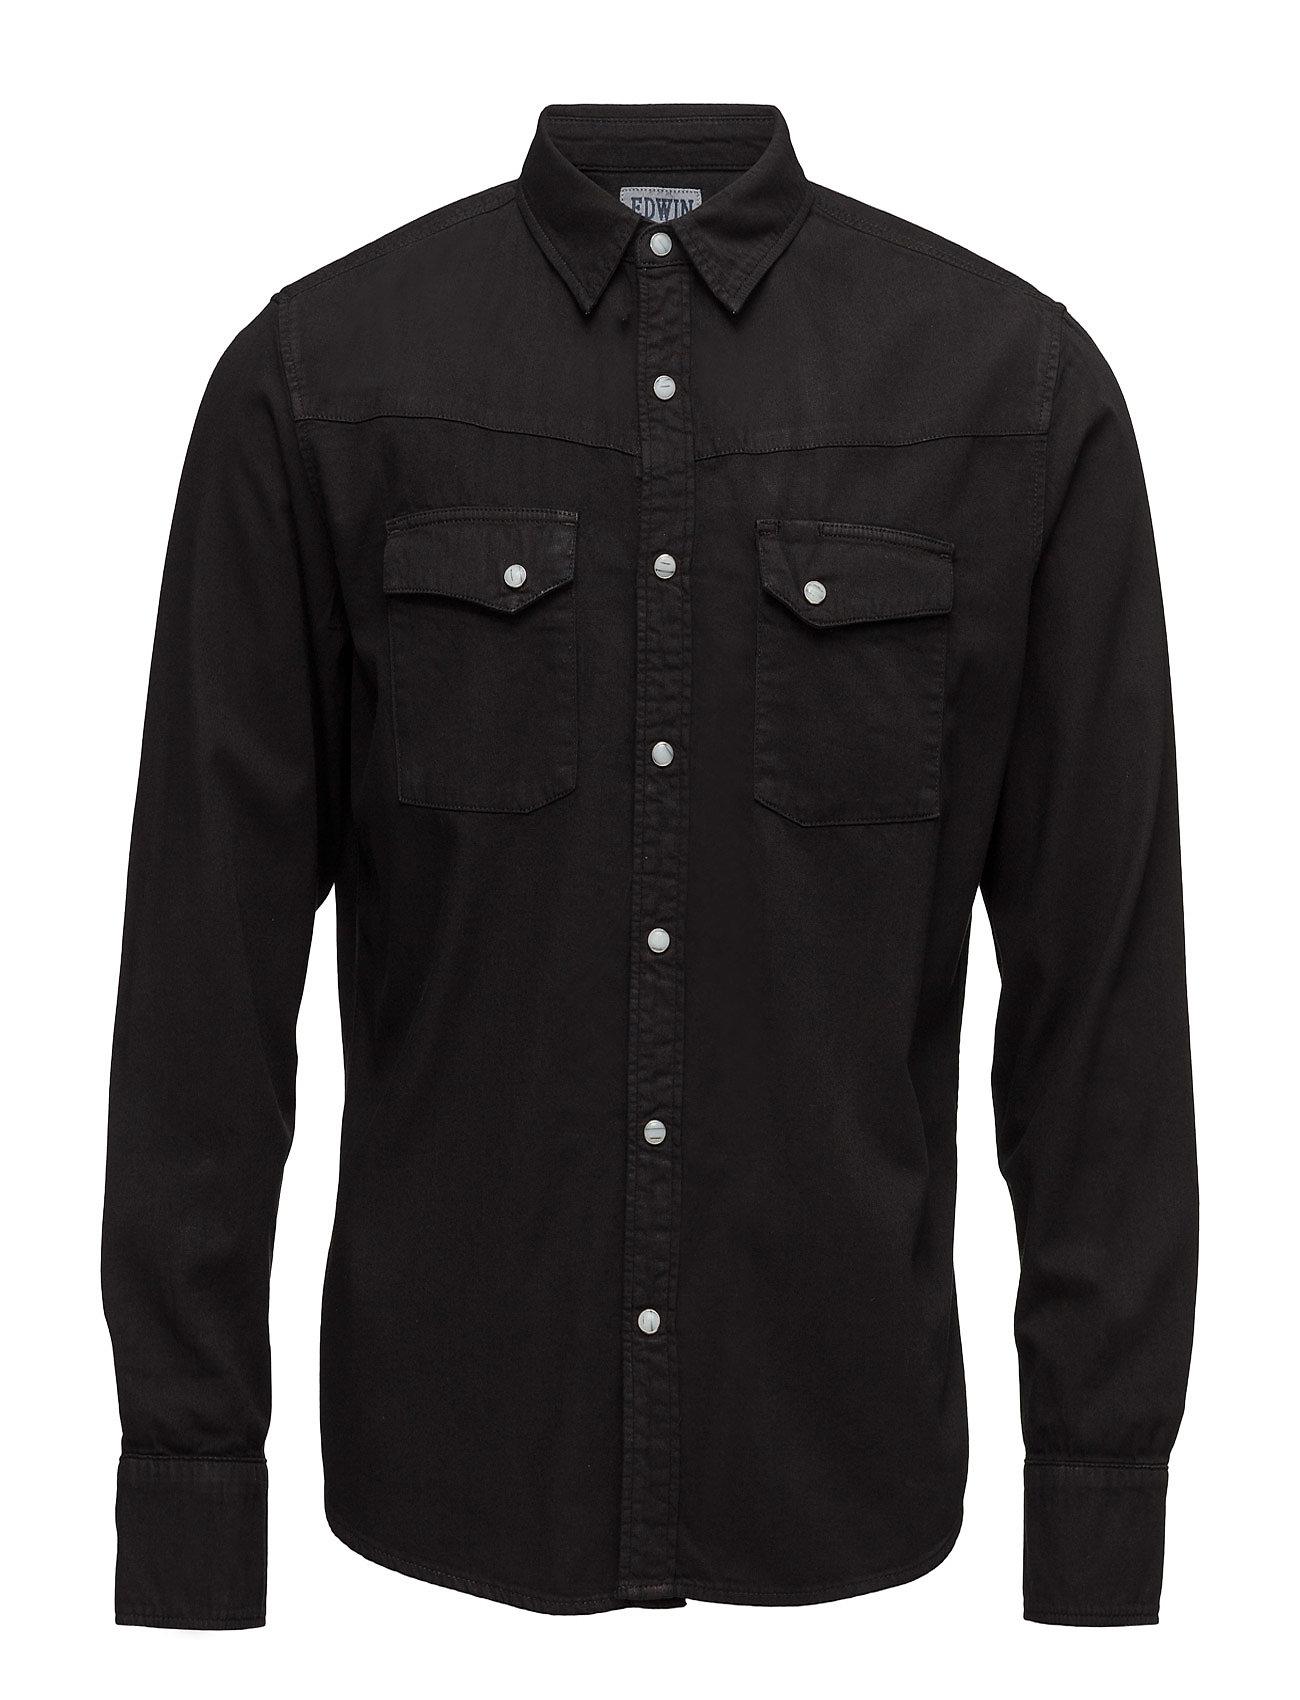 edwin – Kaito shirt på boozt.com dk